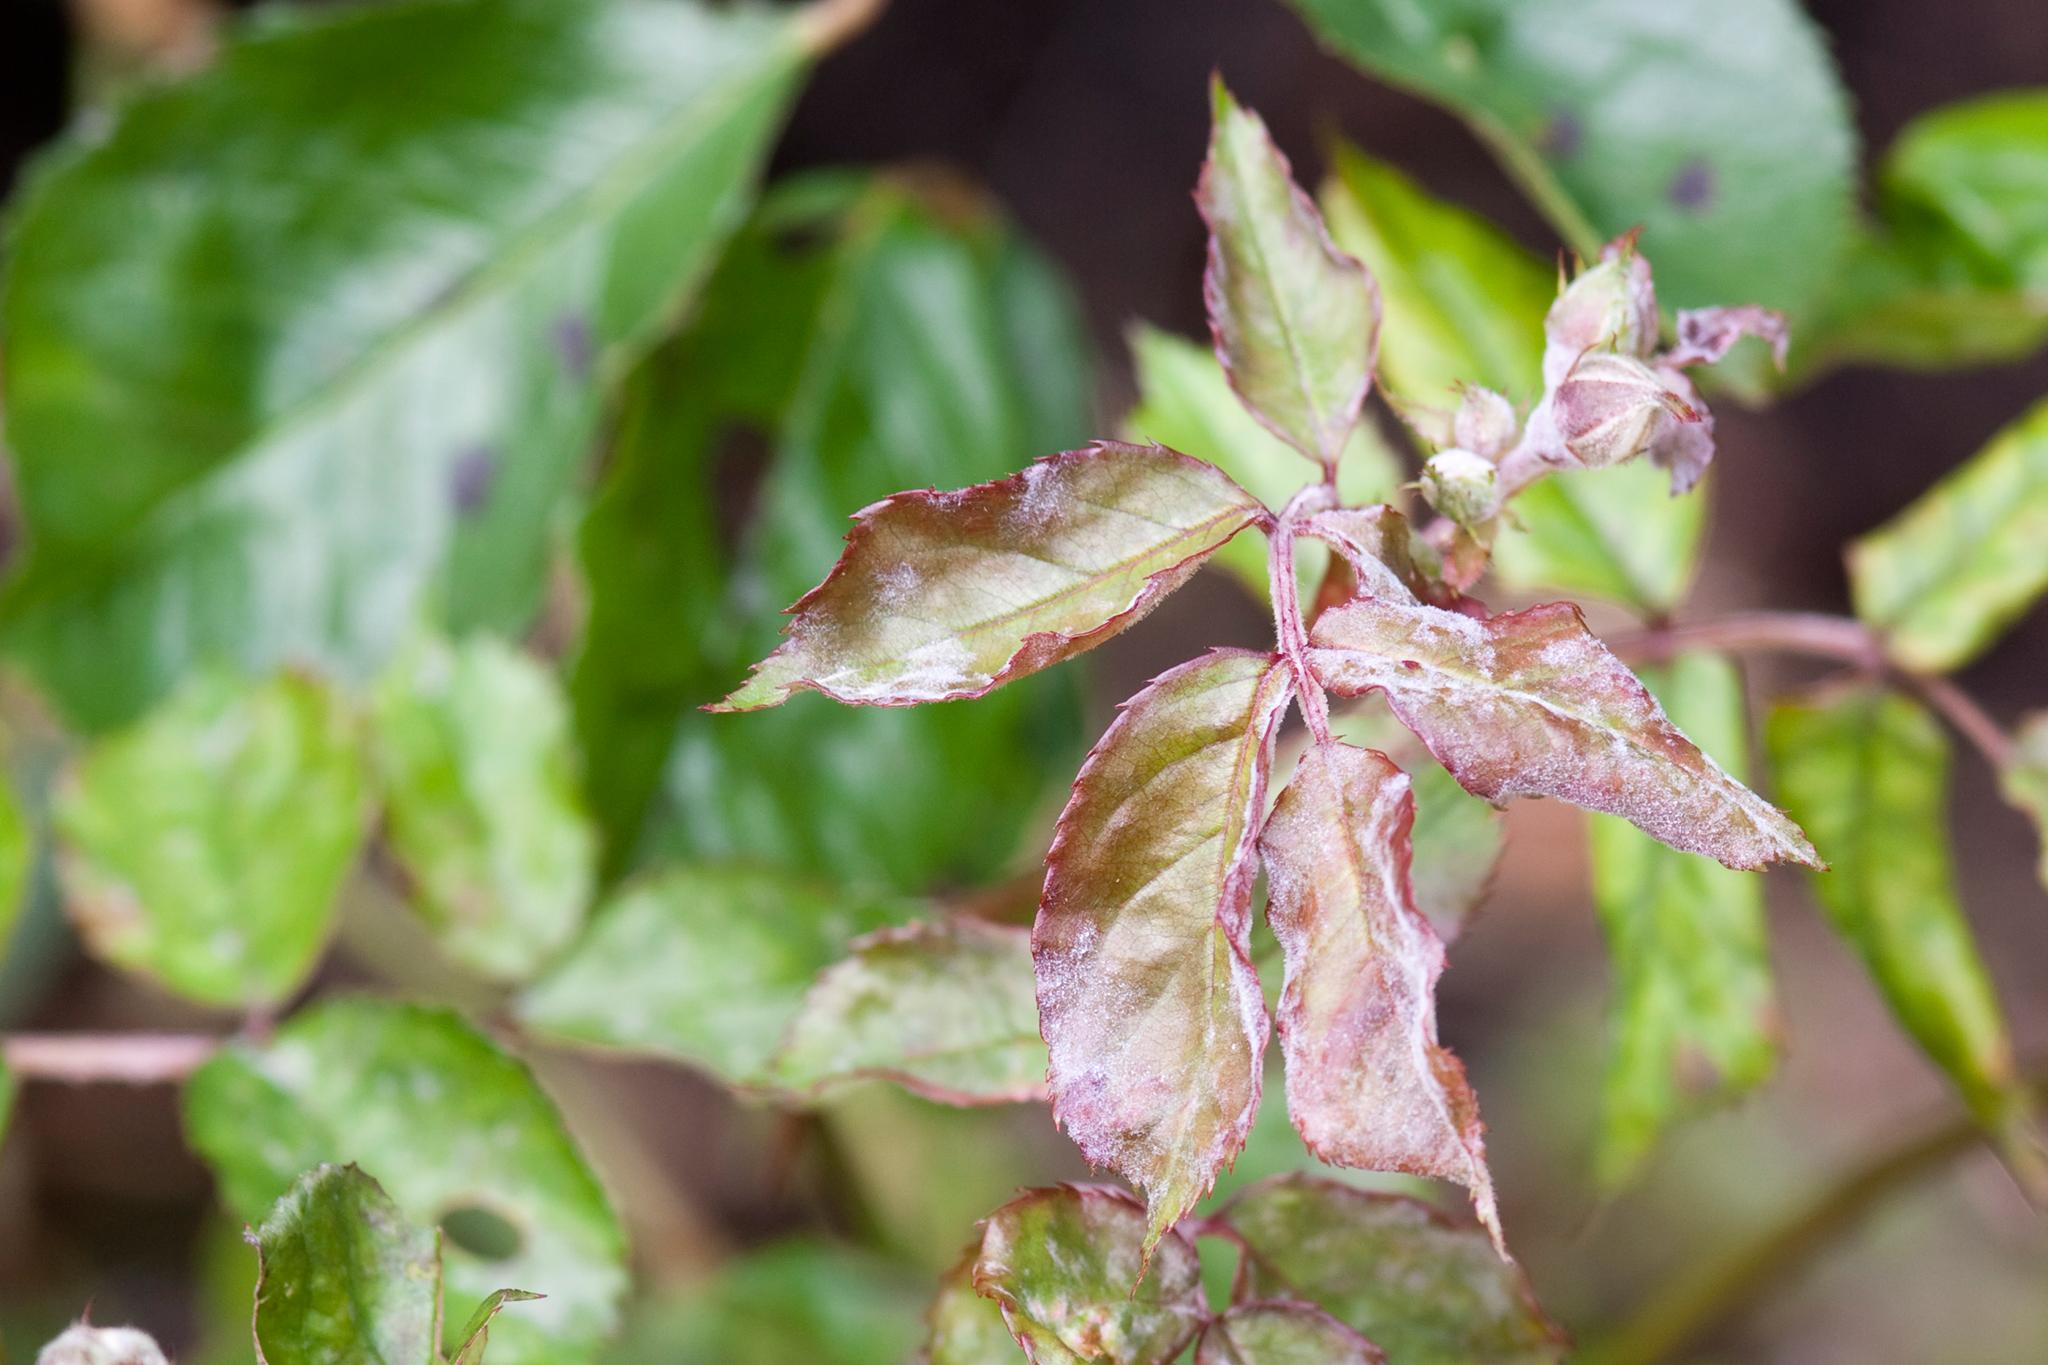 rose-powdery-mildew-2